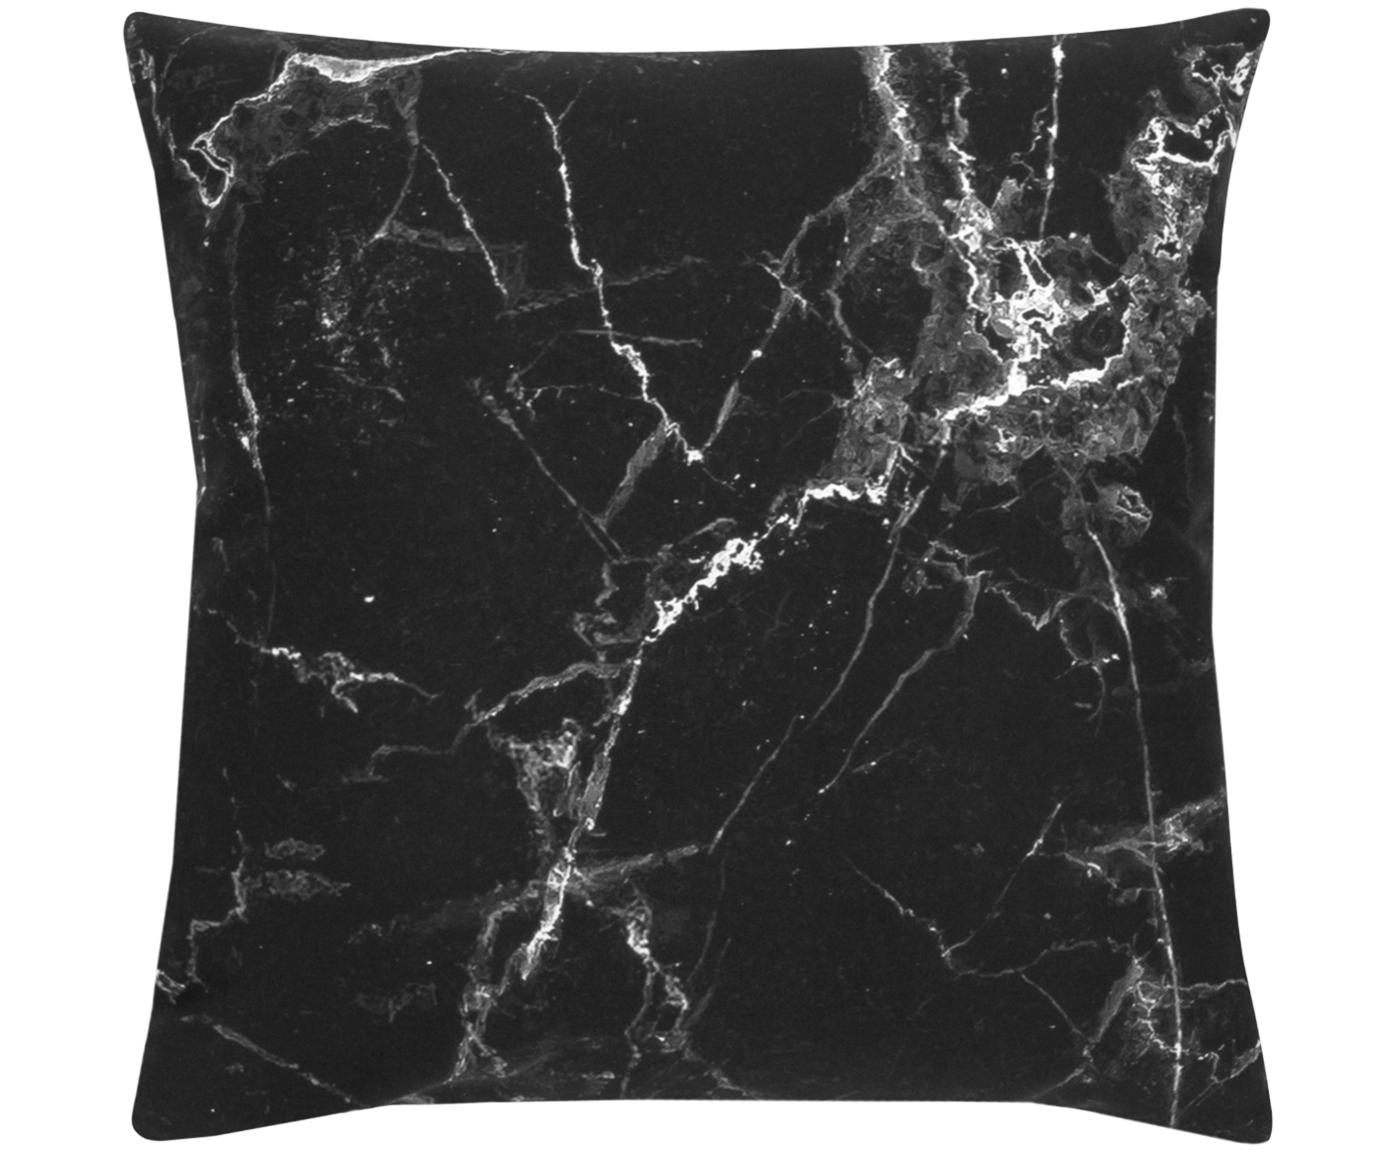 Kissenhülle Malin mit Marmormuster, Webart: Perkal, Marmormuster, Schwarz, 45 x 45 cm